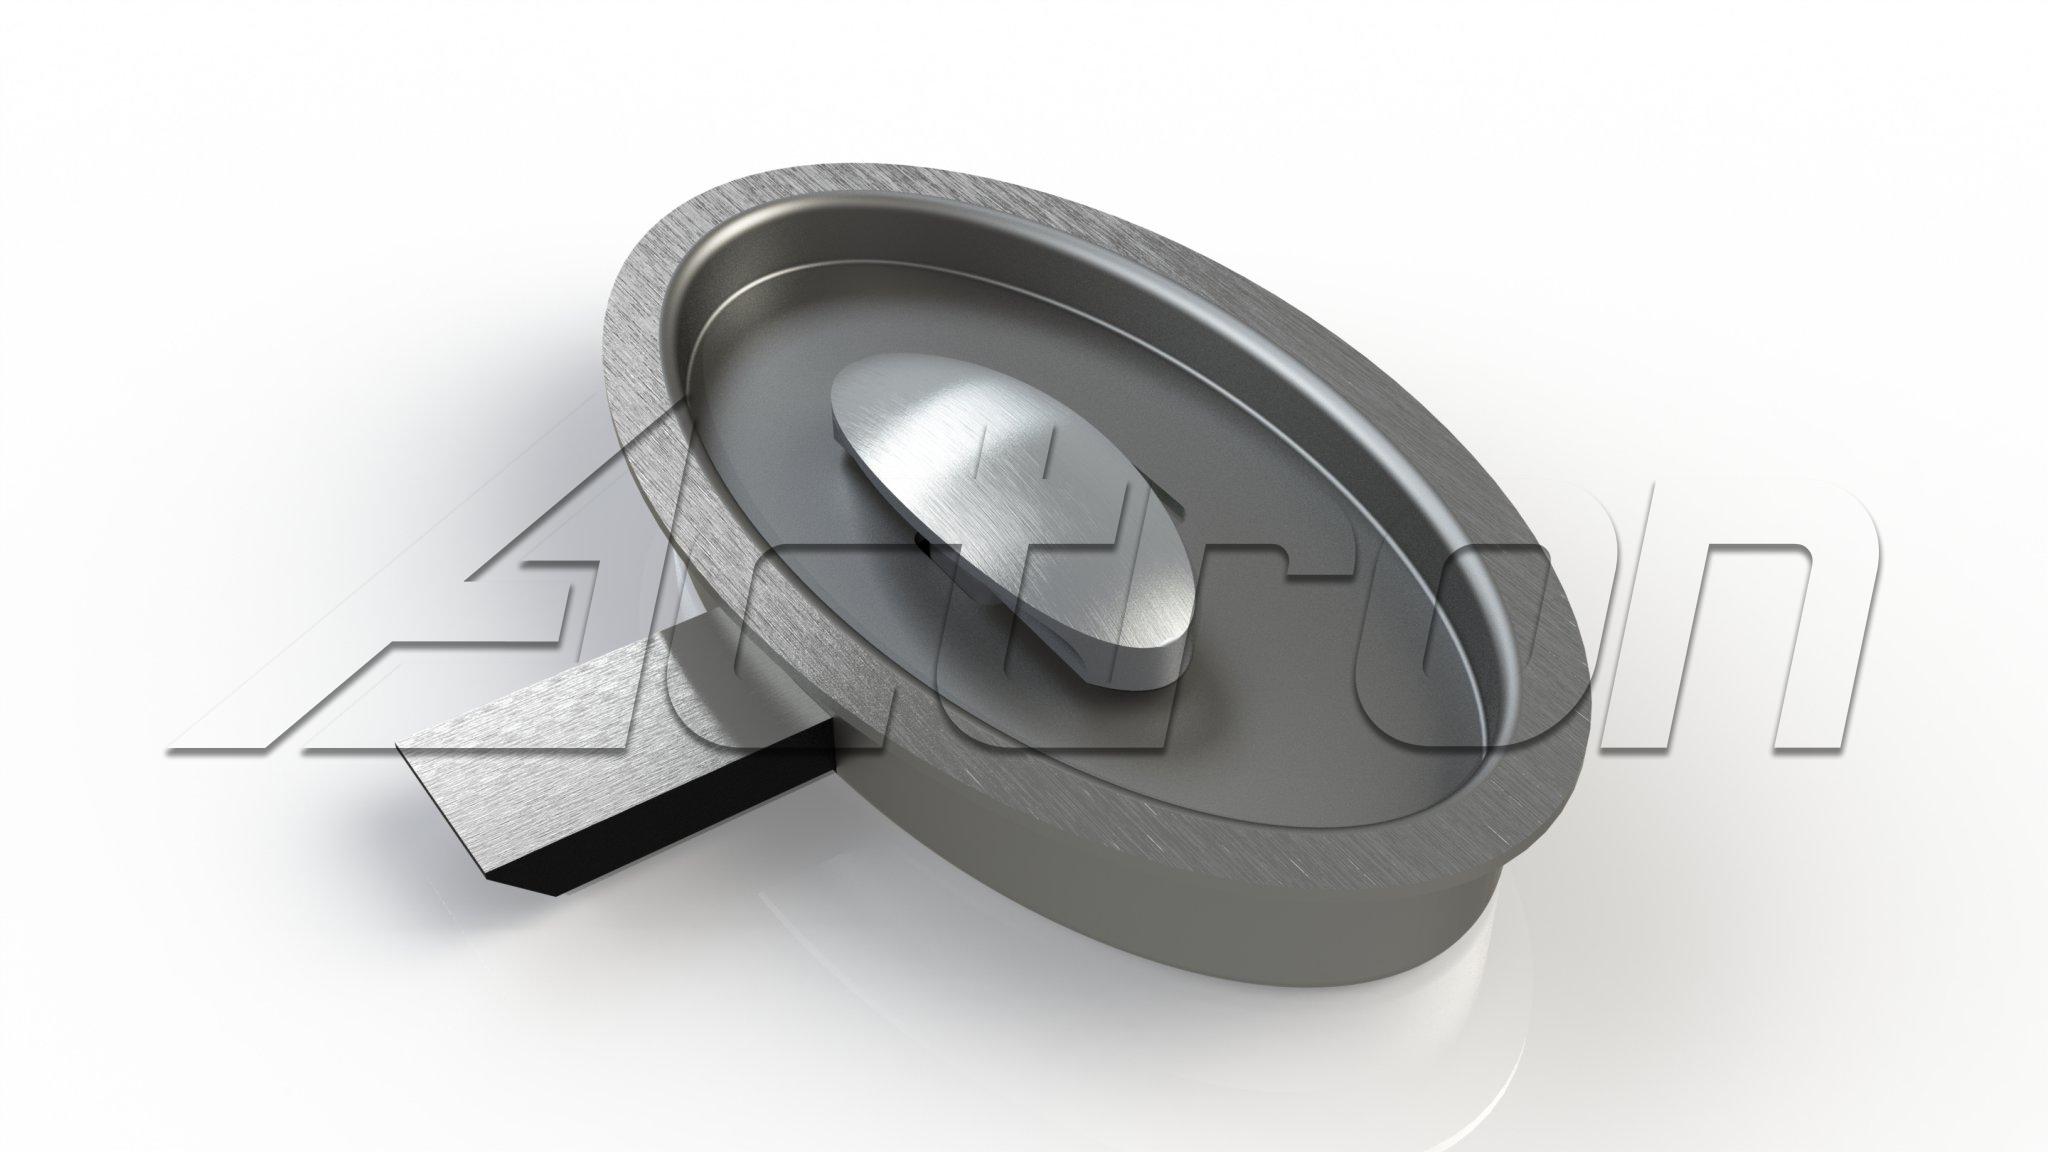 latch-assy-8211-sliding-4410-a27380.jpg